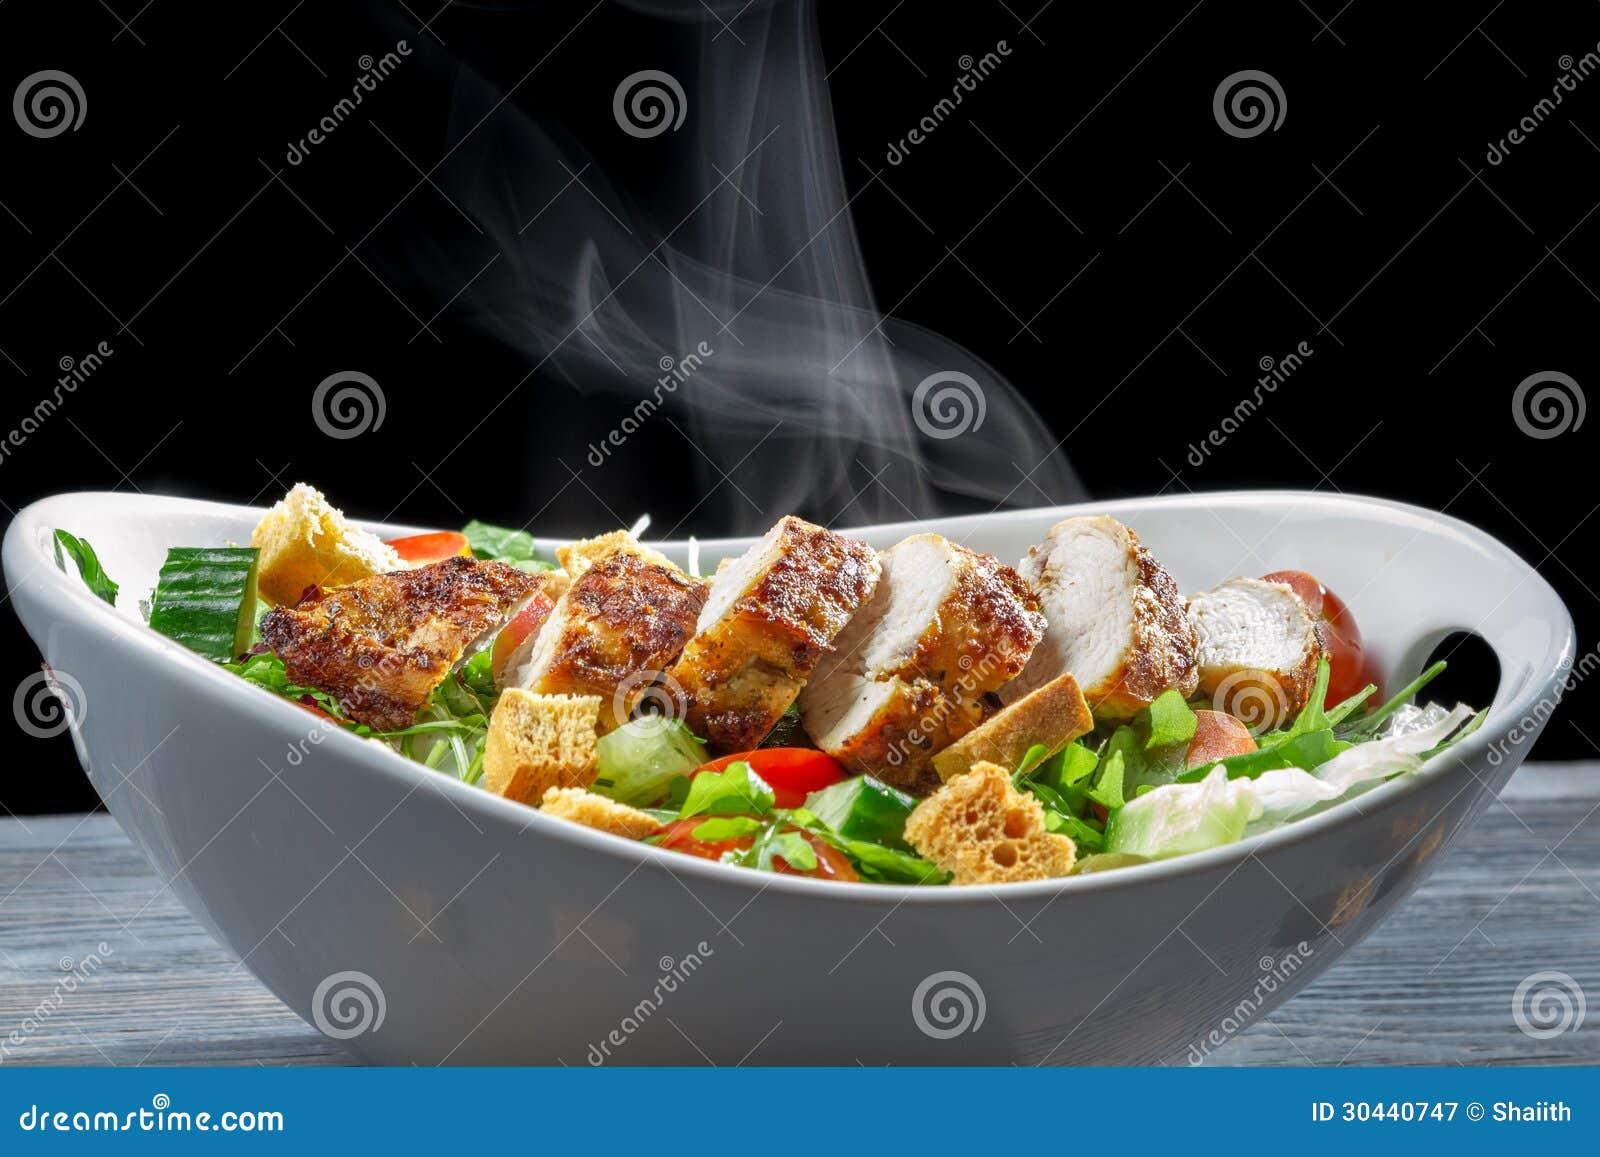 Caesar salad made of fresh ingredients